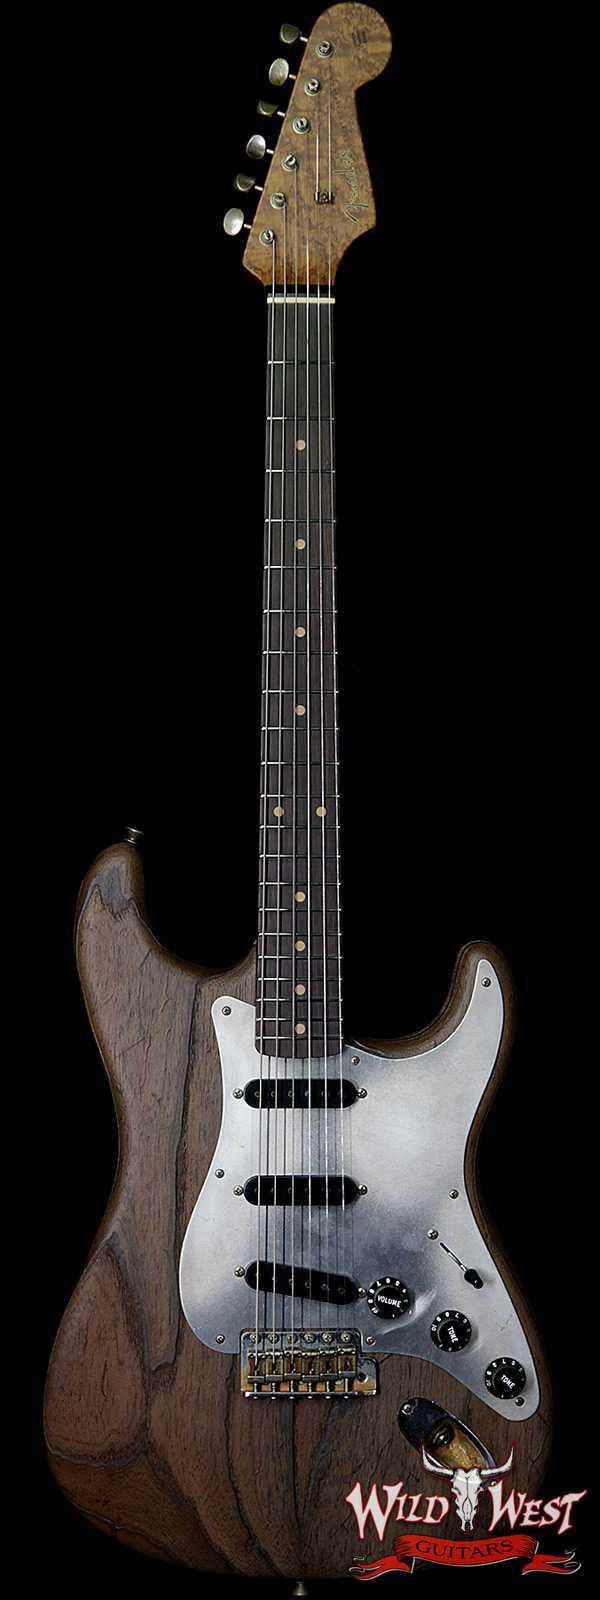 Fender Custom Shop 2019 NAMM #448 Kyle McMillin Masterbuilt Steel Stain Stratocaster Heavy Relic